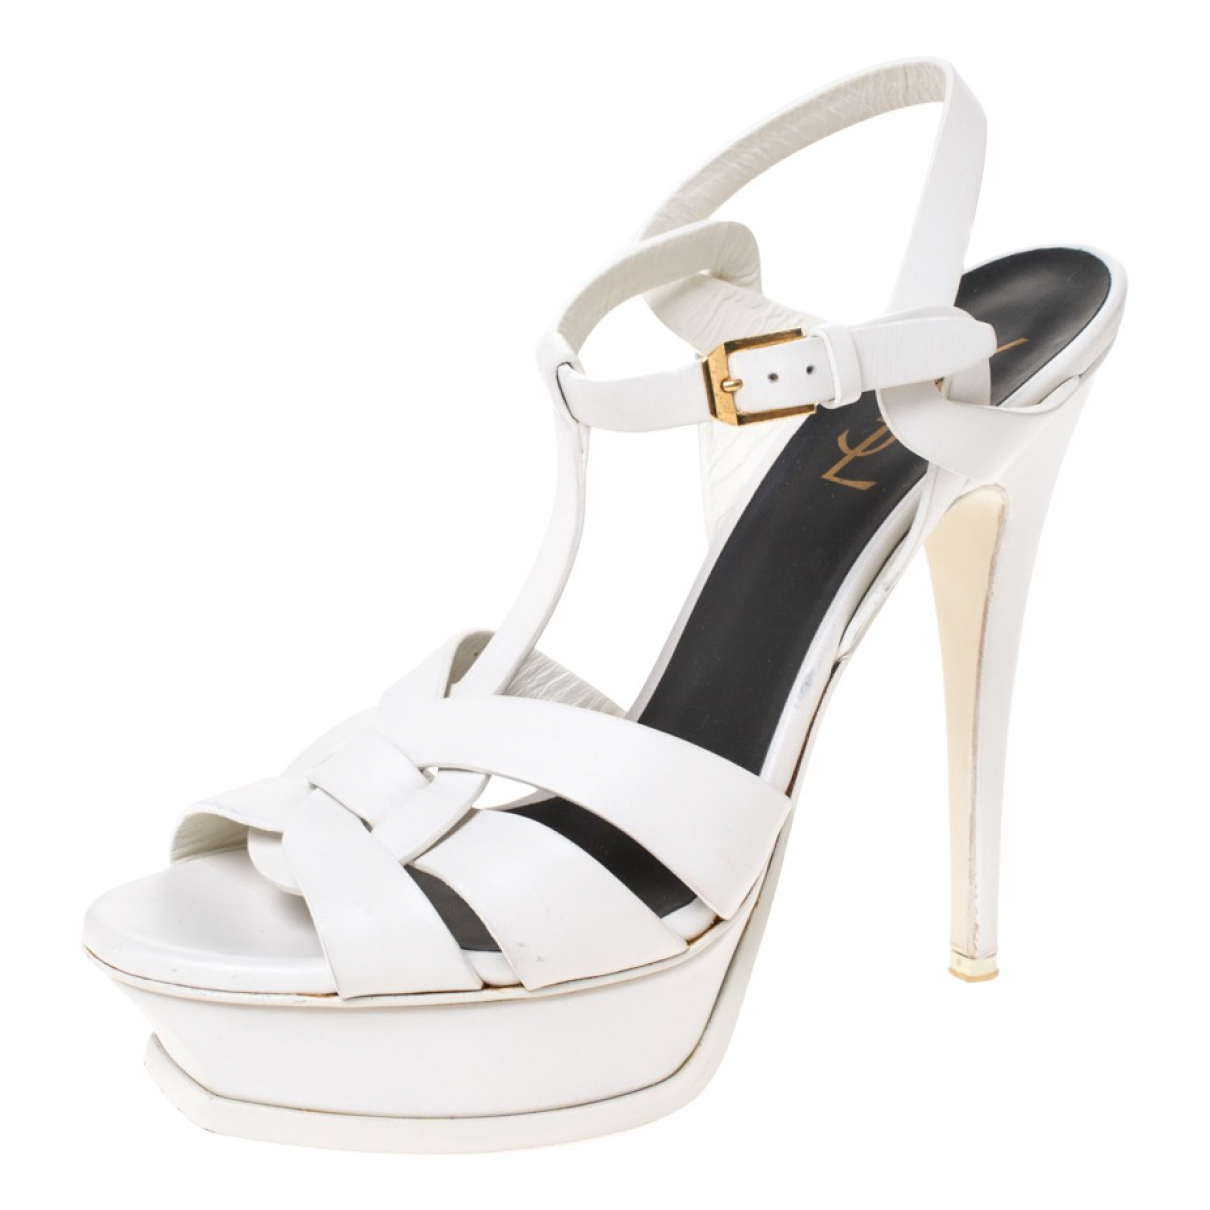 Saint Laurent \N White Leather Sandals for Women 8 US